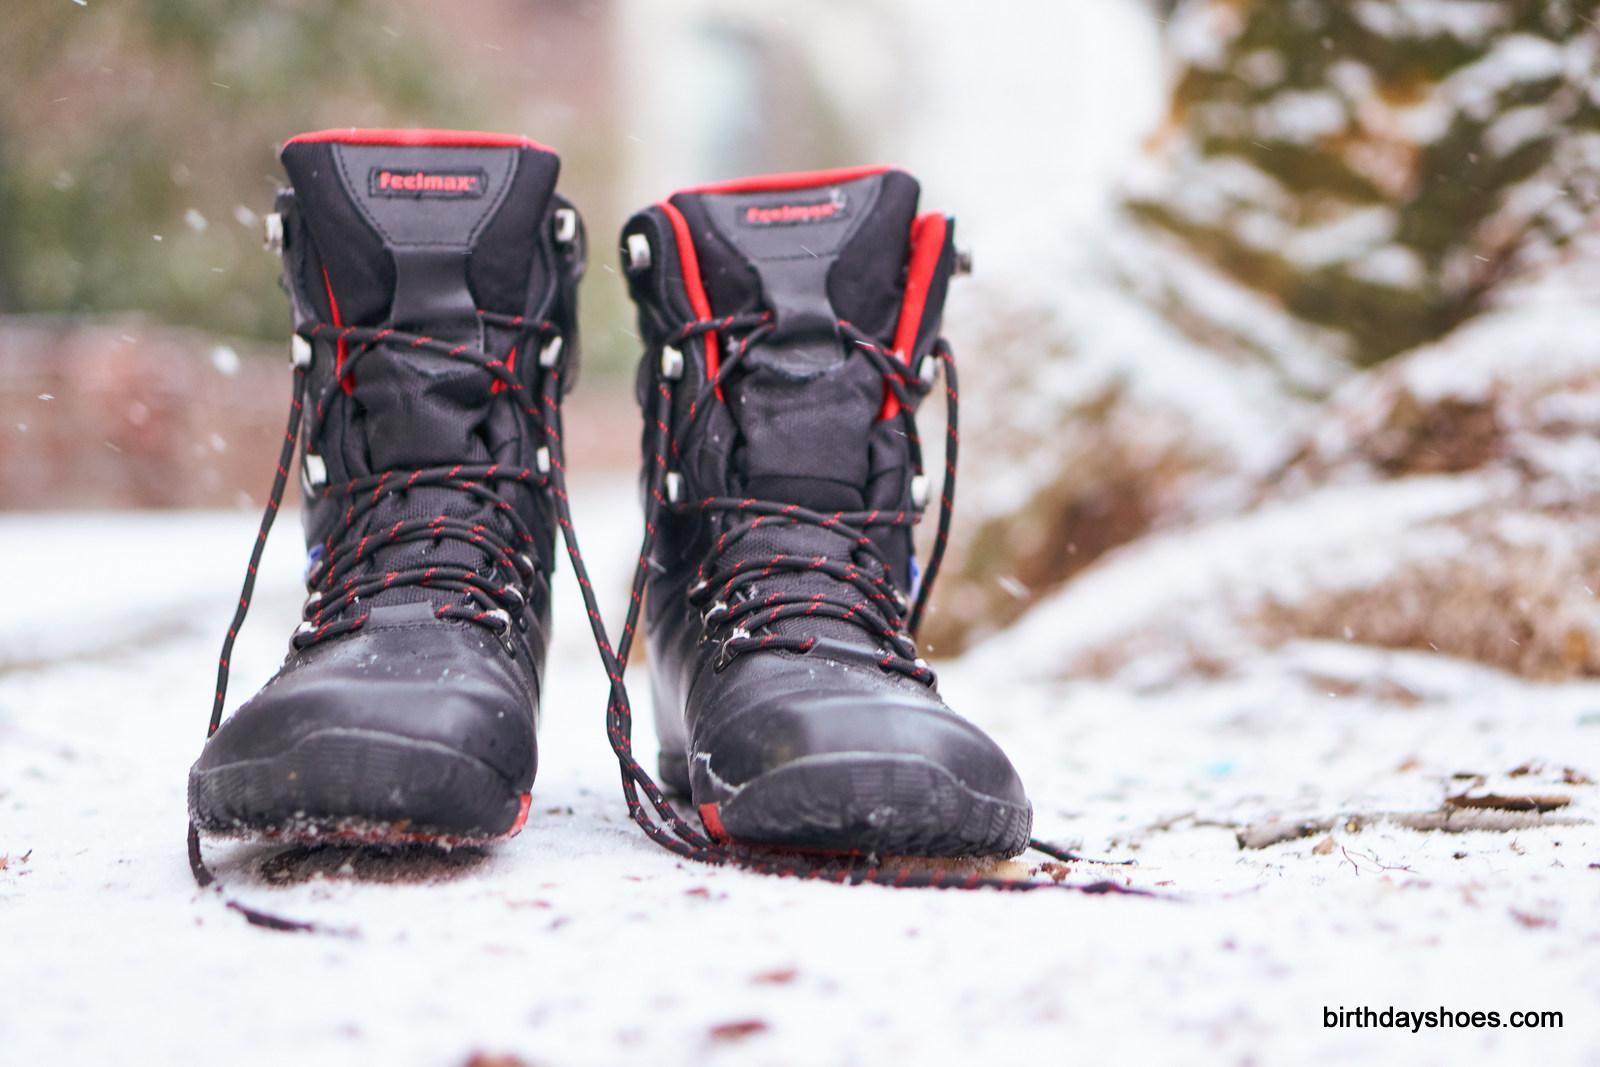 My favorite winter boot